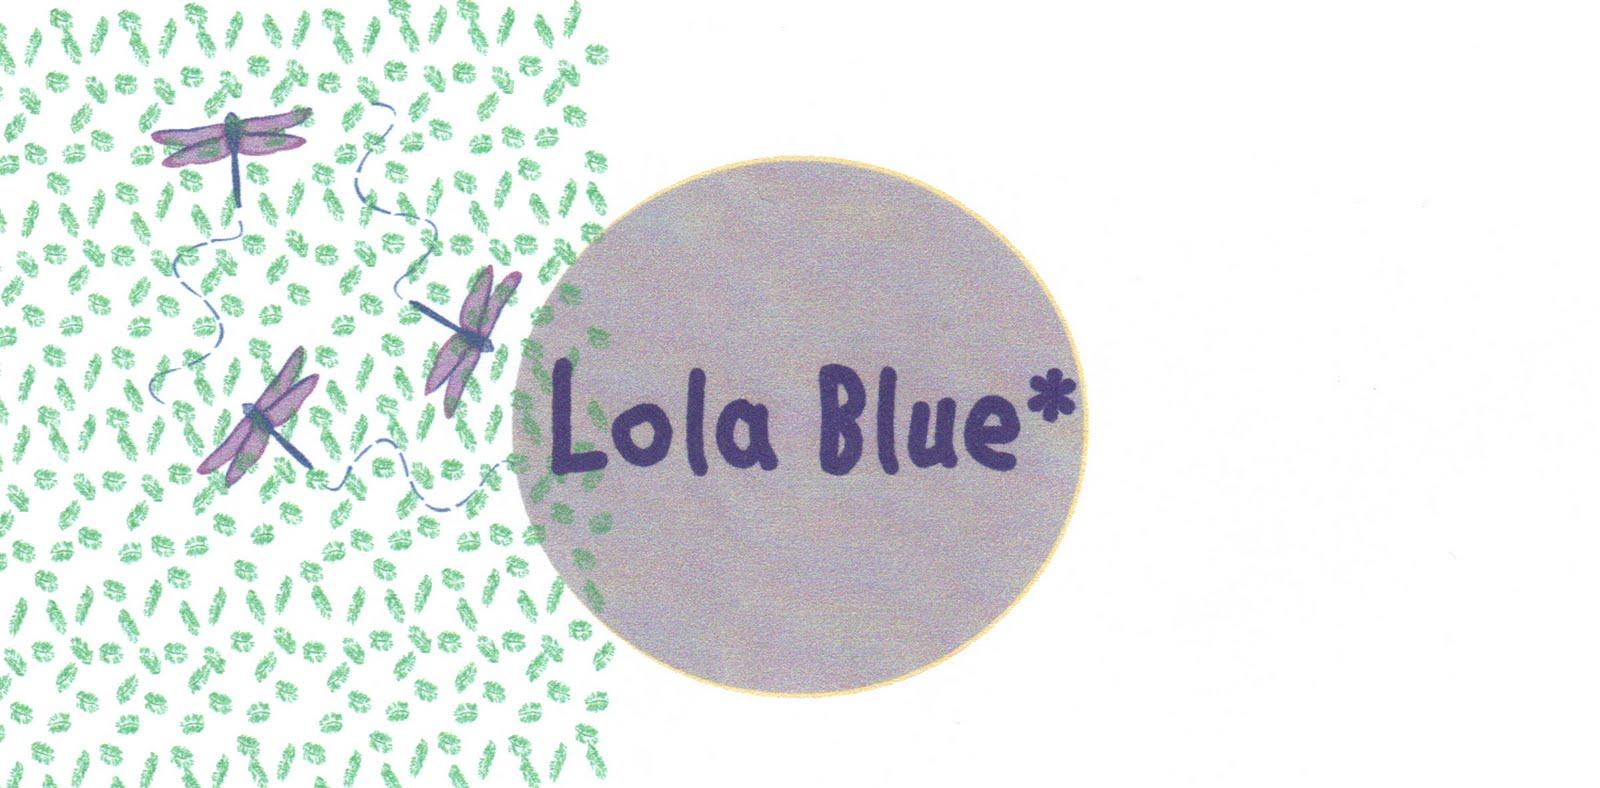 Lola Blue*